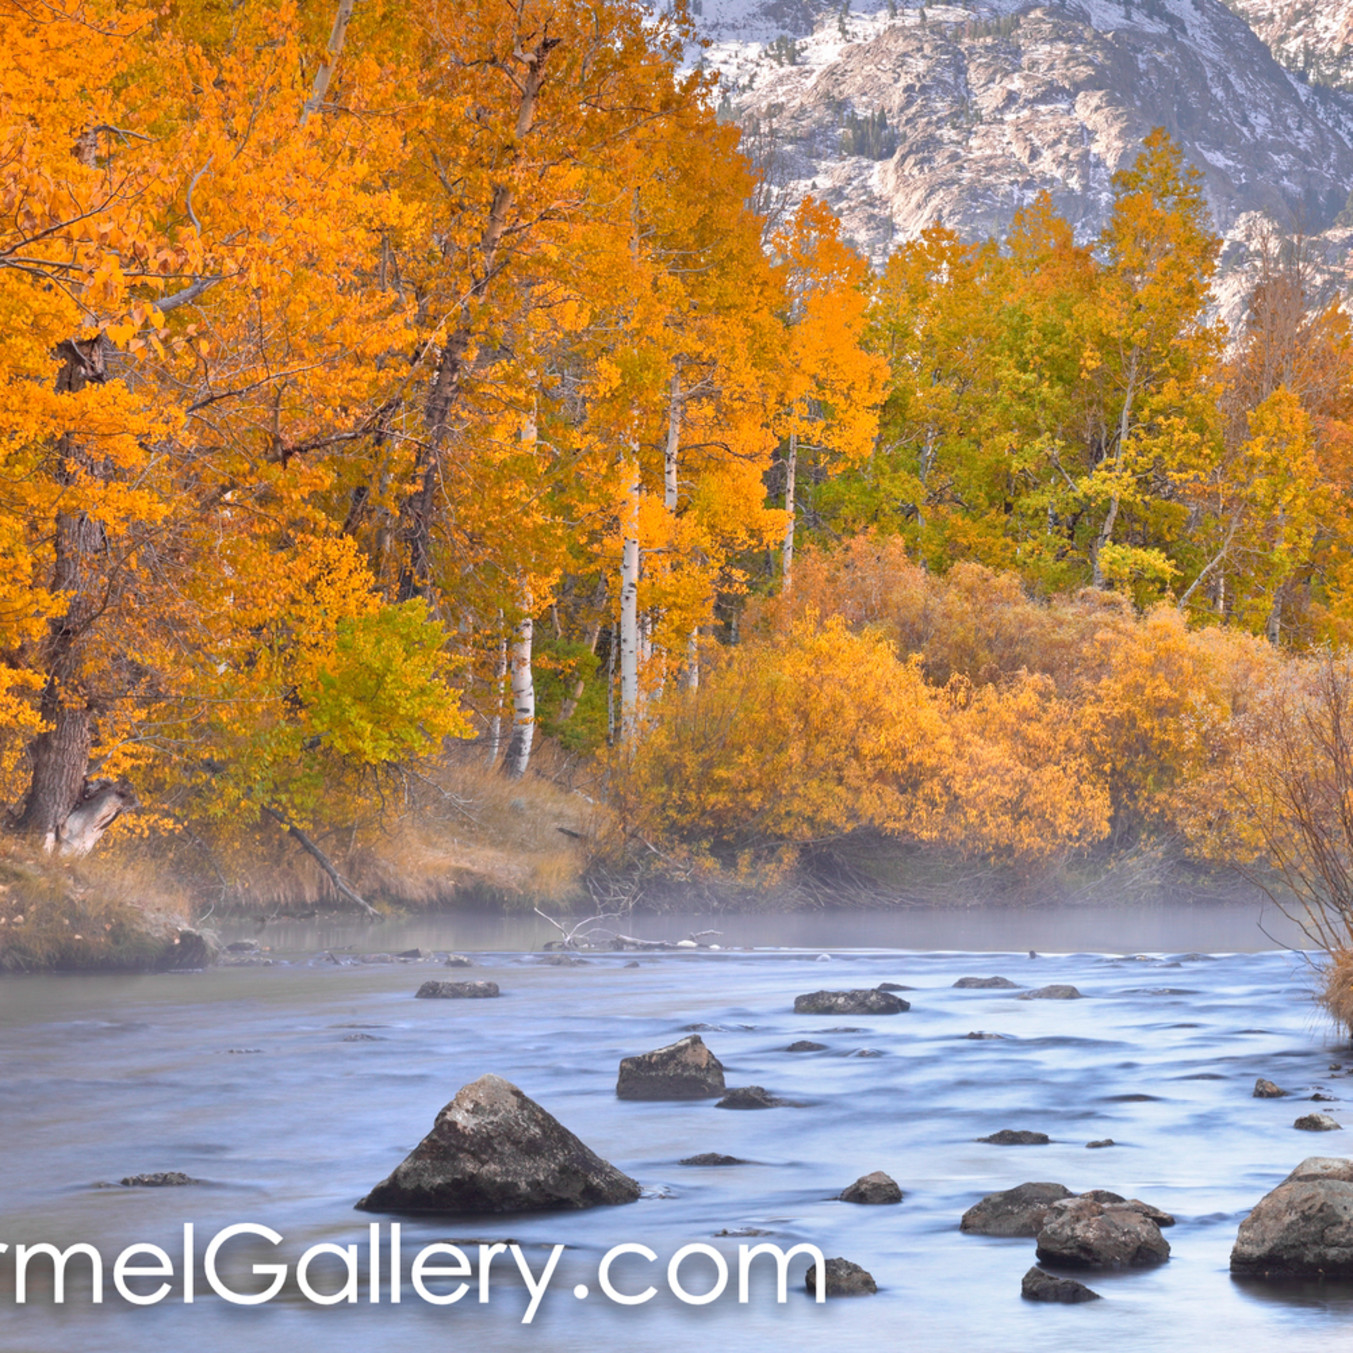 Rush creek autumn jkibqp